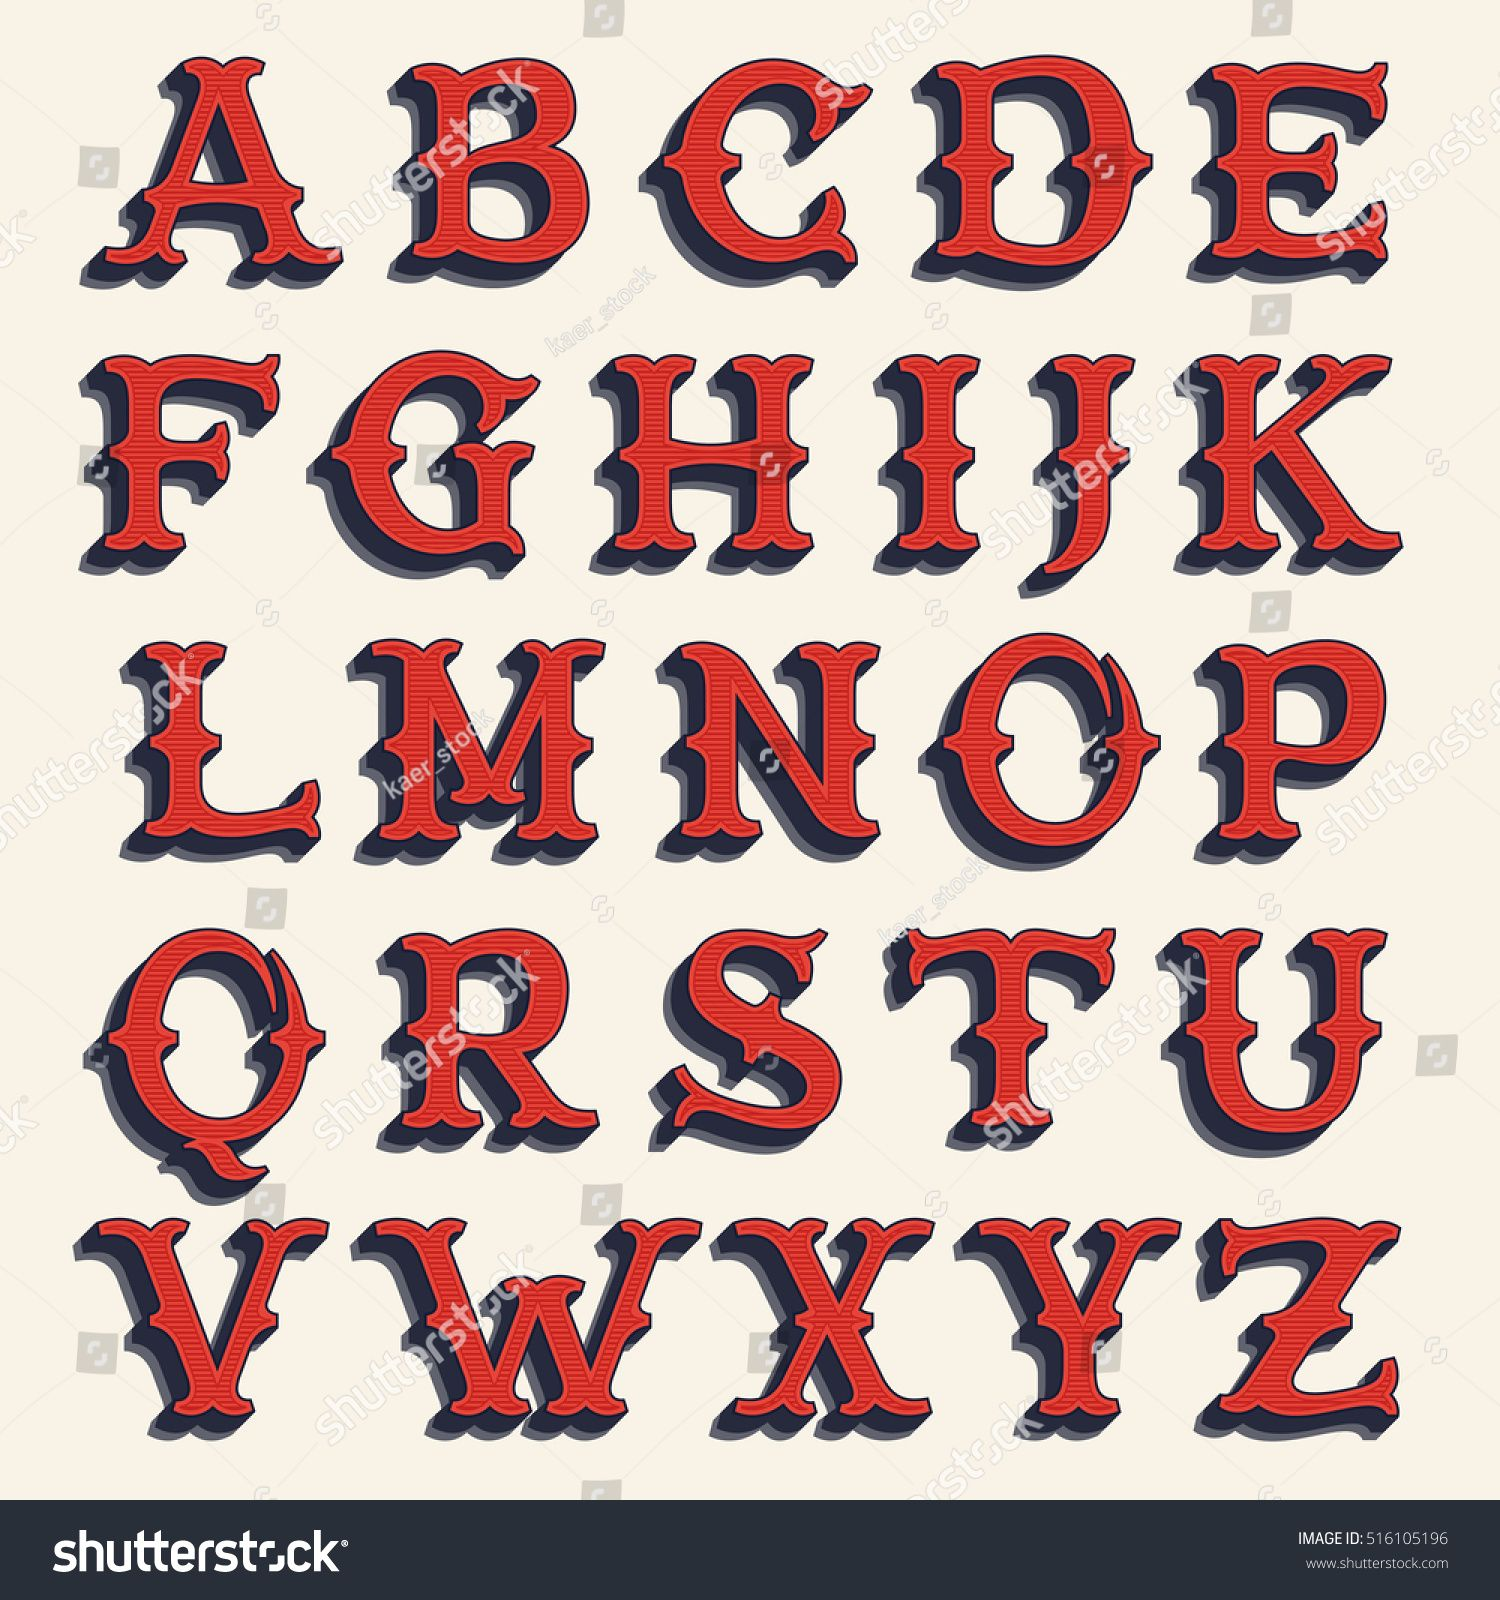 Retro Alphabet Vintage Western Style Volume Typeface Vector Font For Labels Posters Etc Lettering Fonts Vintage Fonts Alphabet Lettering Alphabet